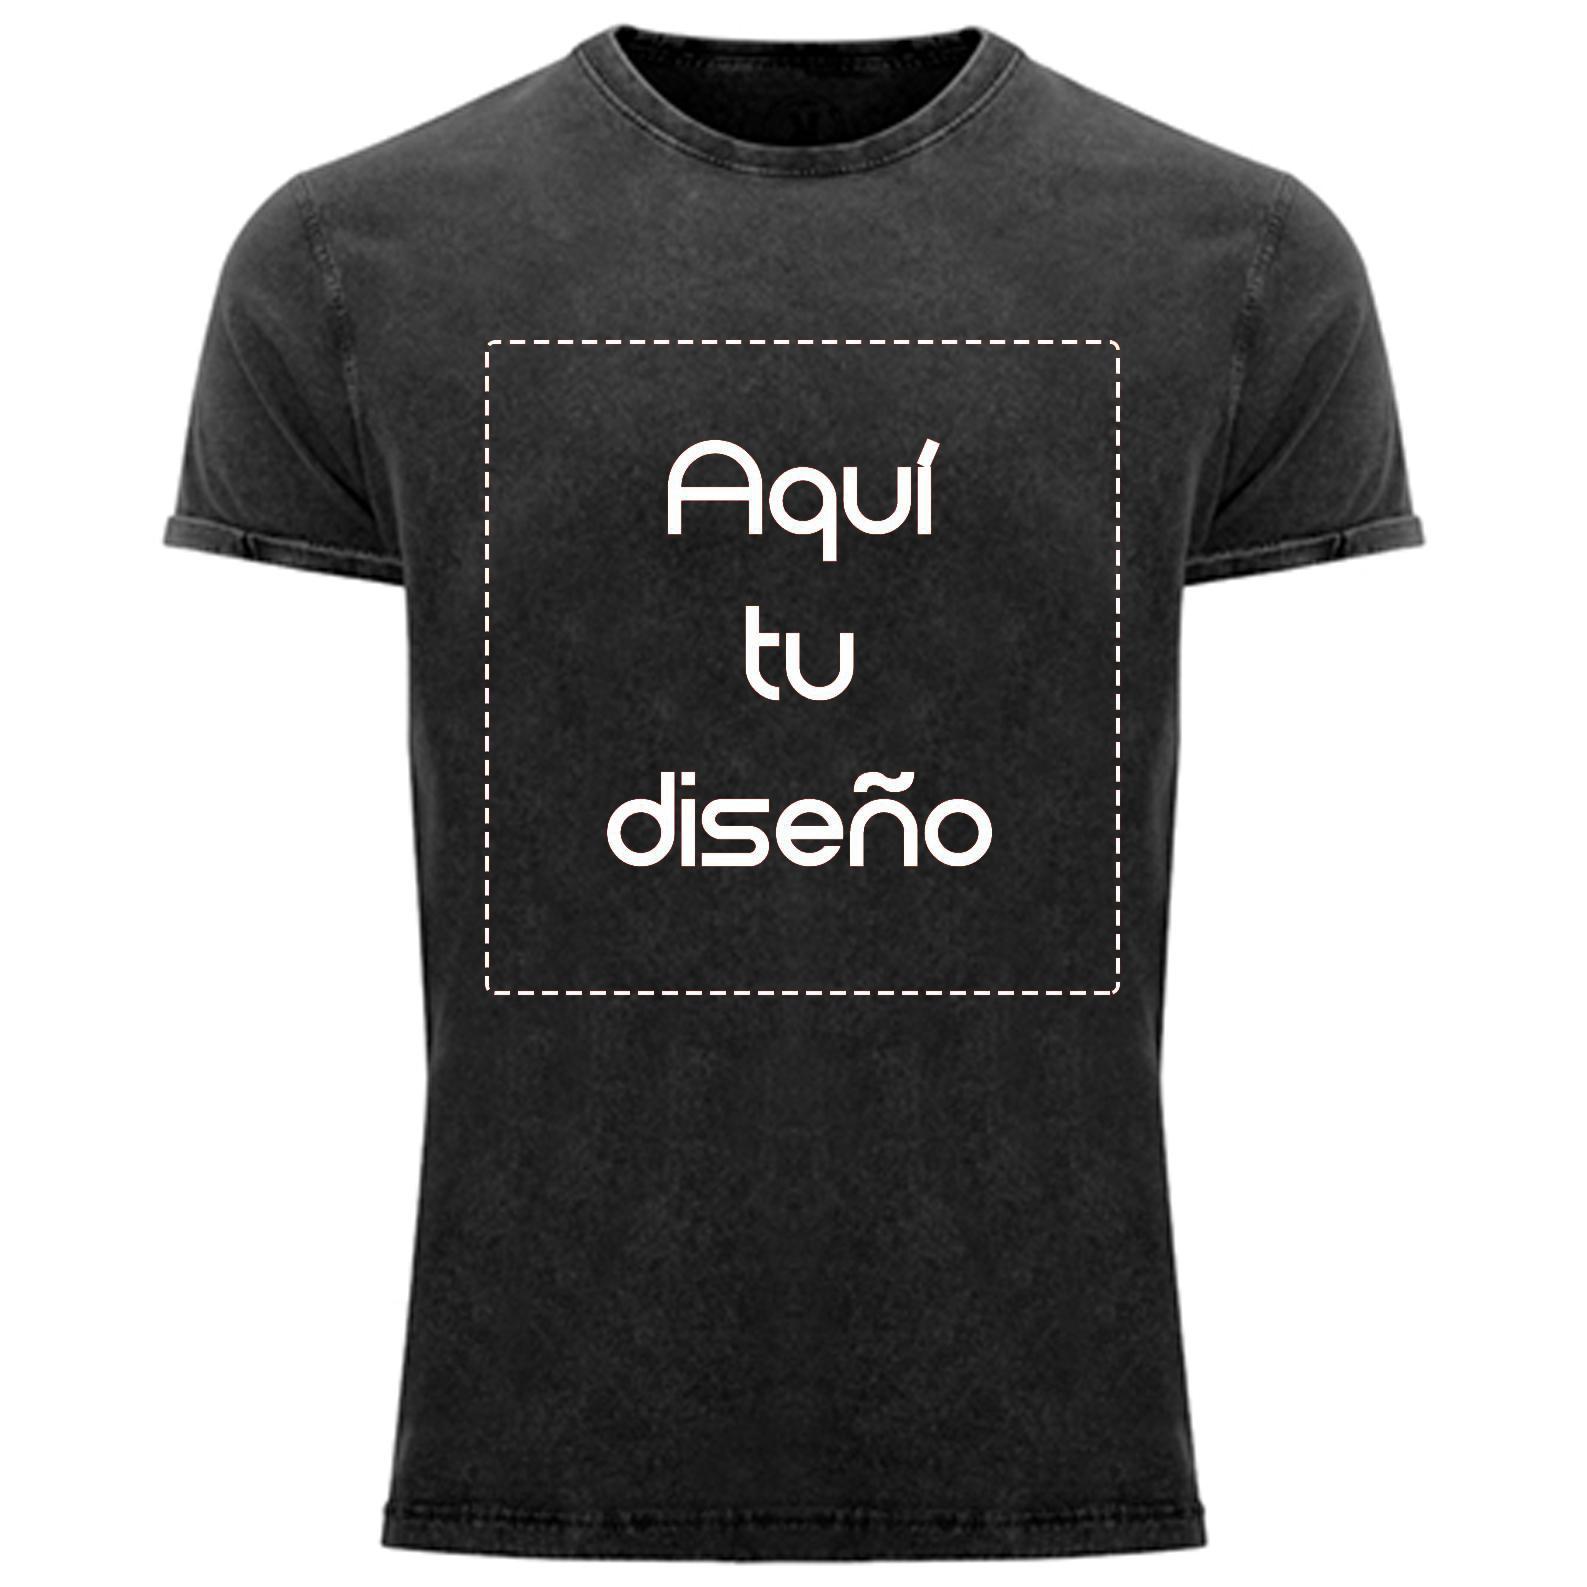 Camiseta vintage negra